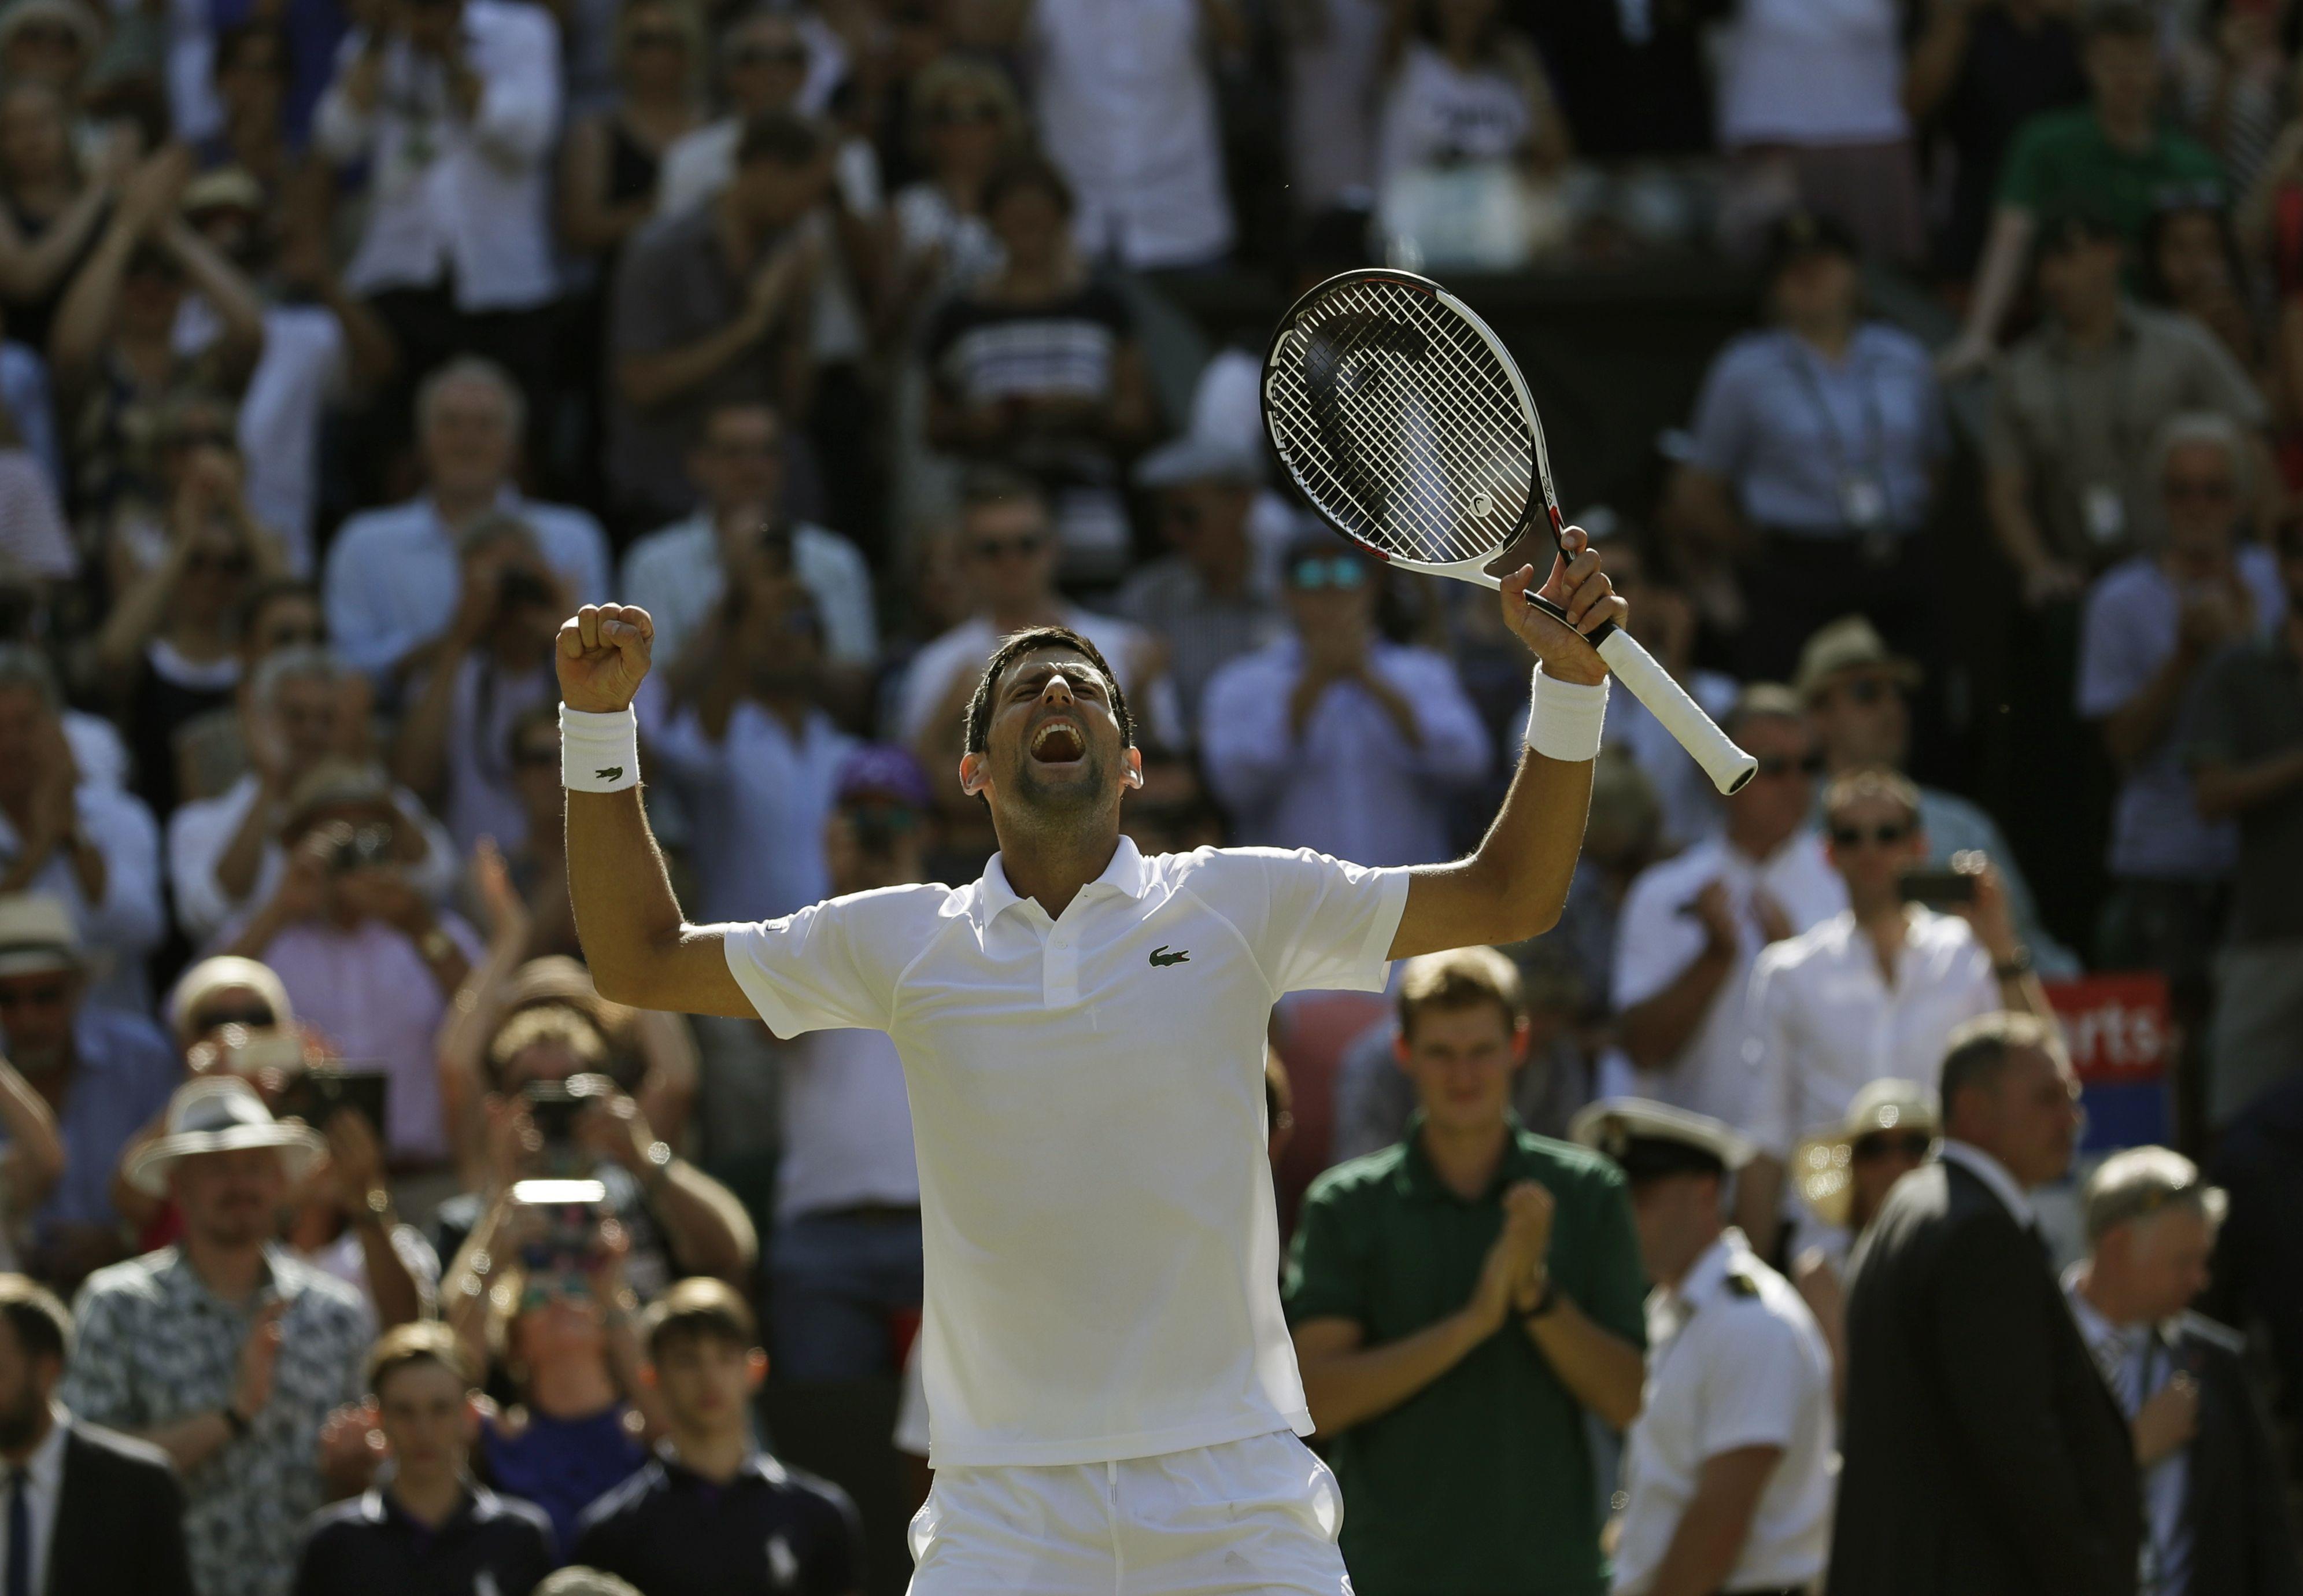 Tennis - Wimbledon - À Wimbledon, Djokovic est redevenu Djokovic